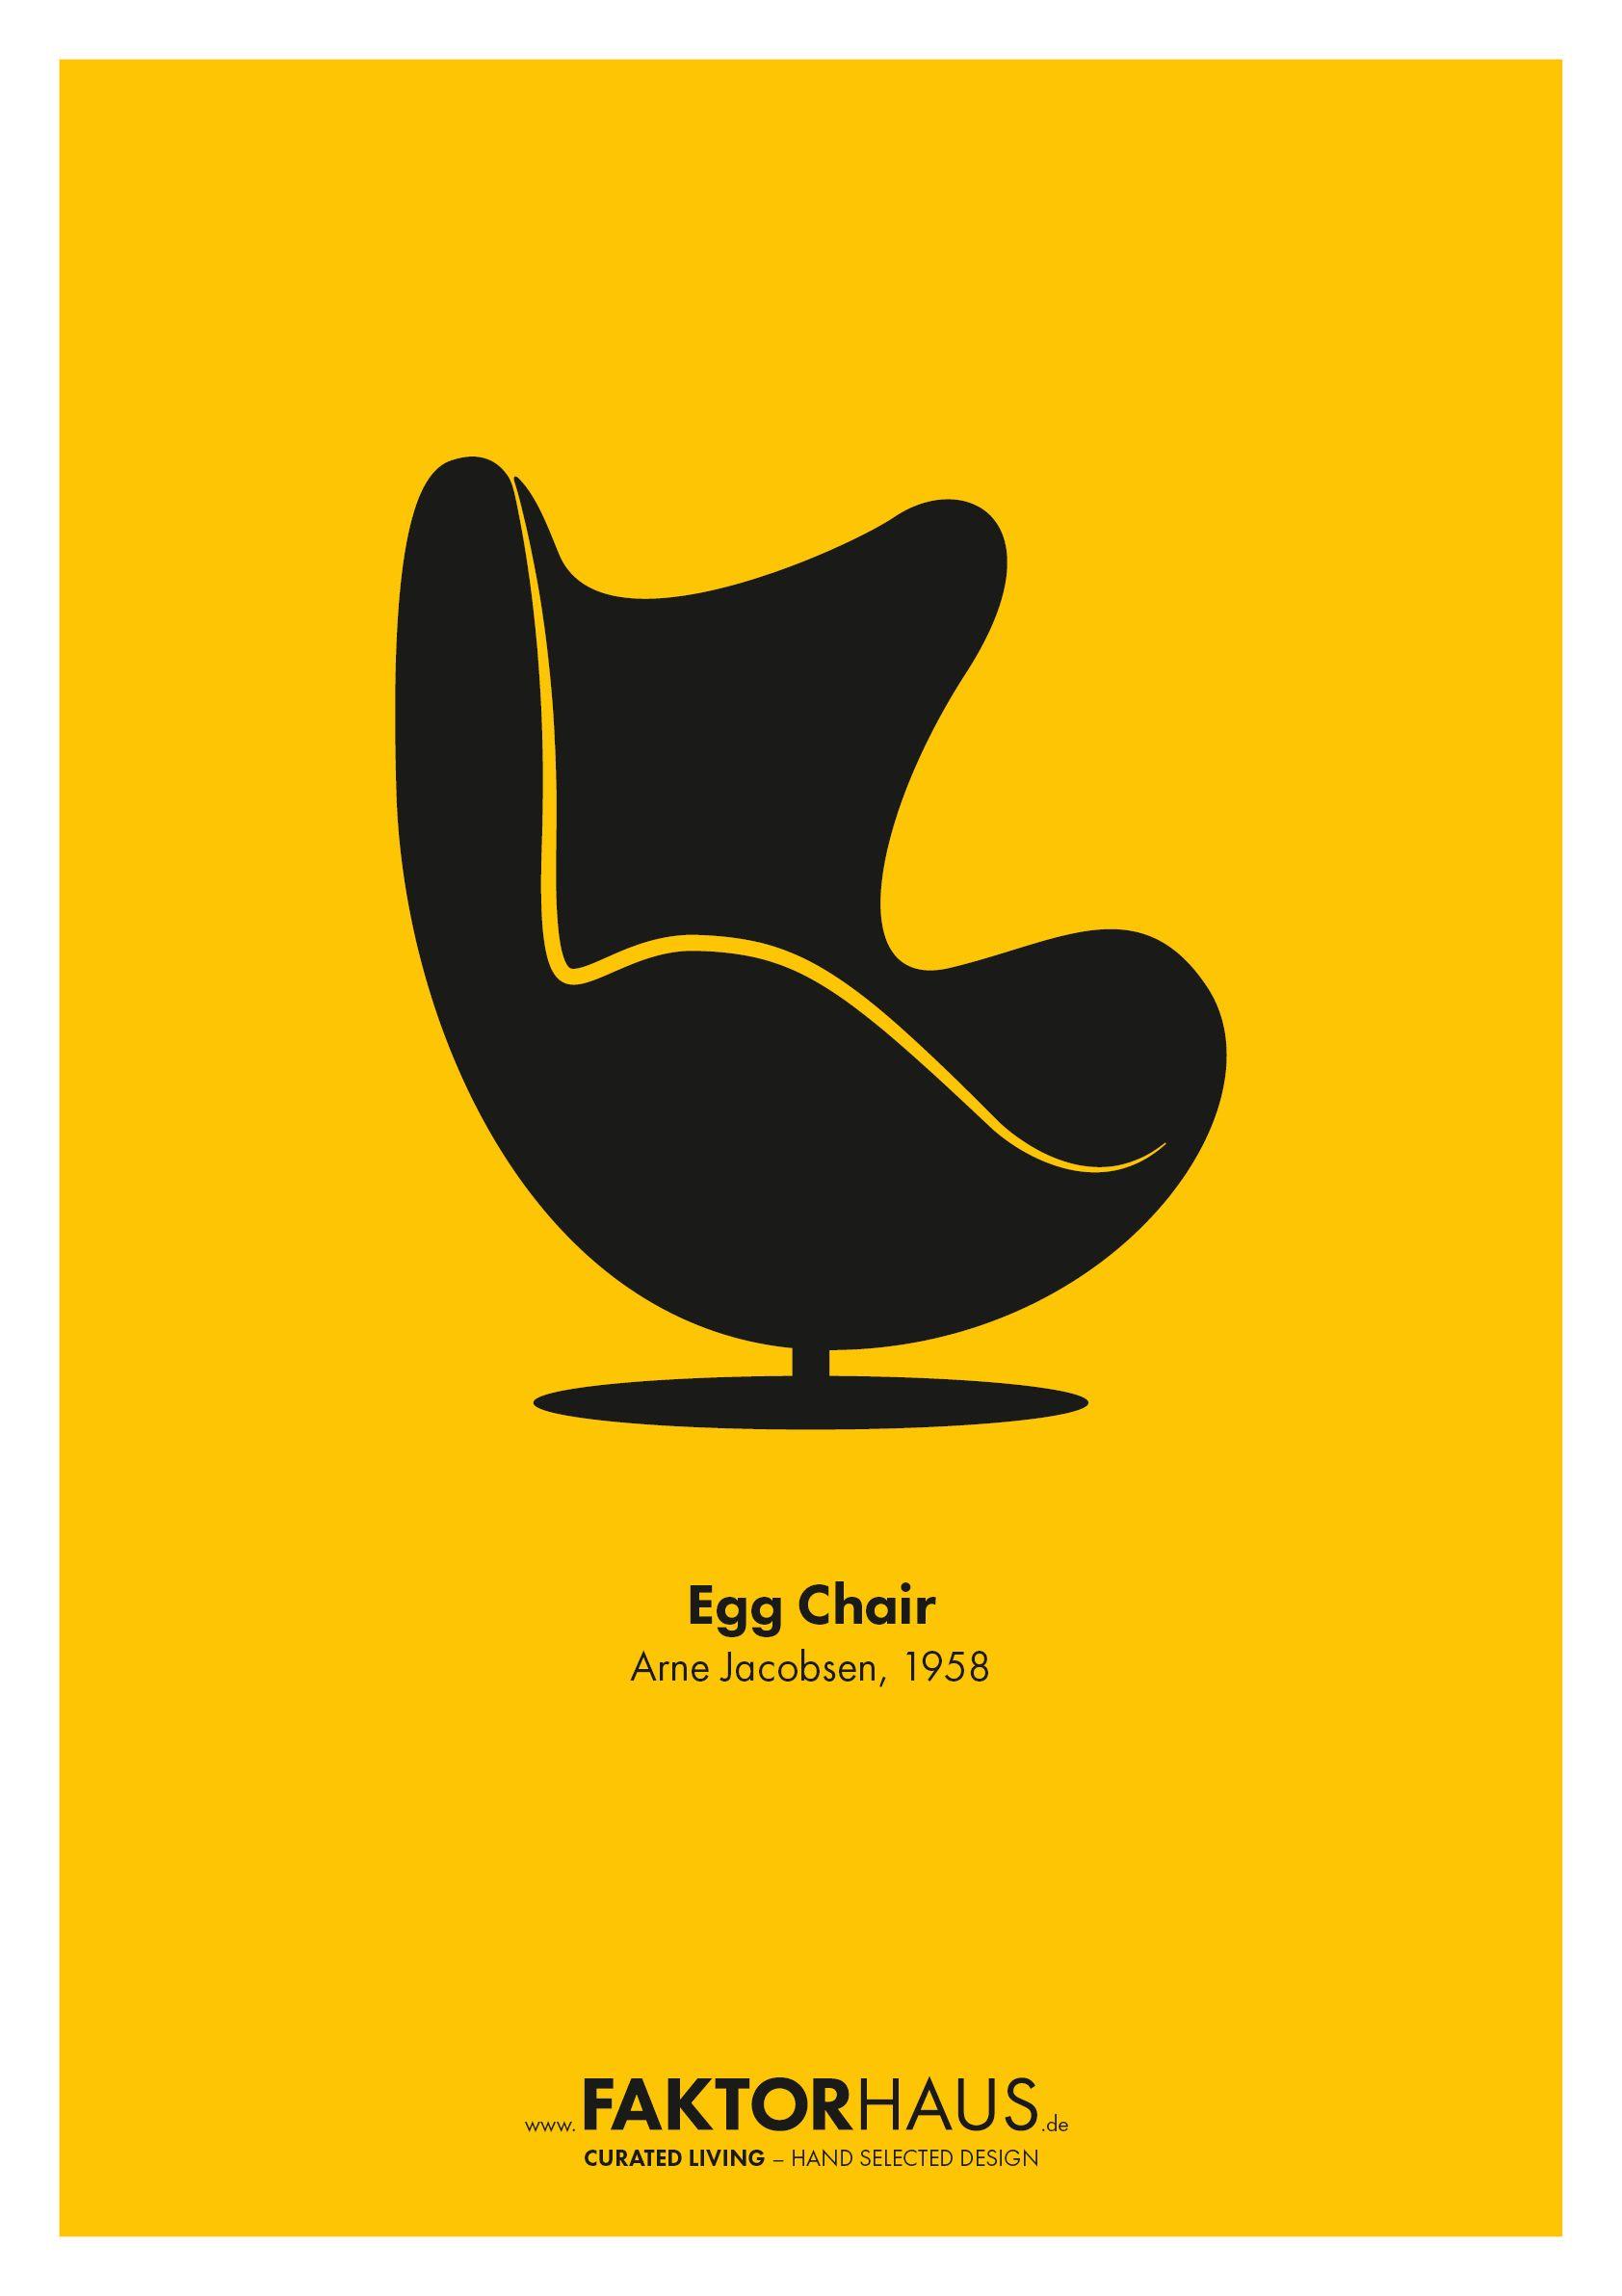 De Egg Chair.Arne Jacobsen Egg Chair 1958 Www Faktorhaus De Eggchair Arne